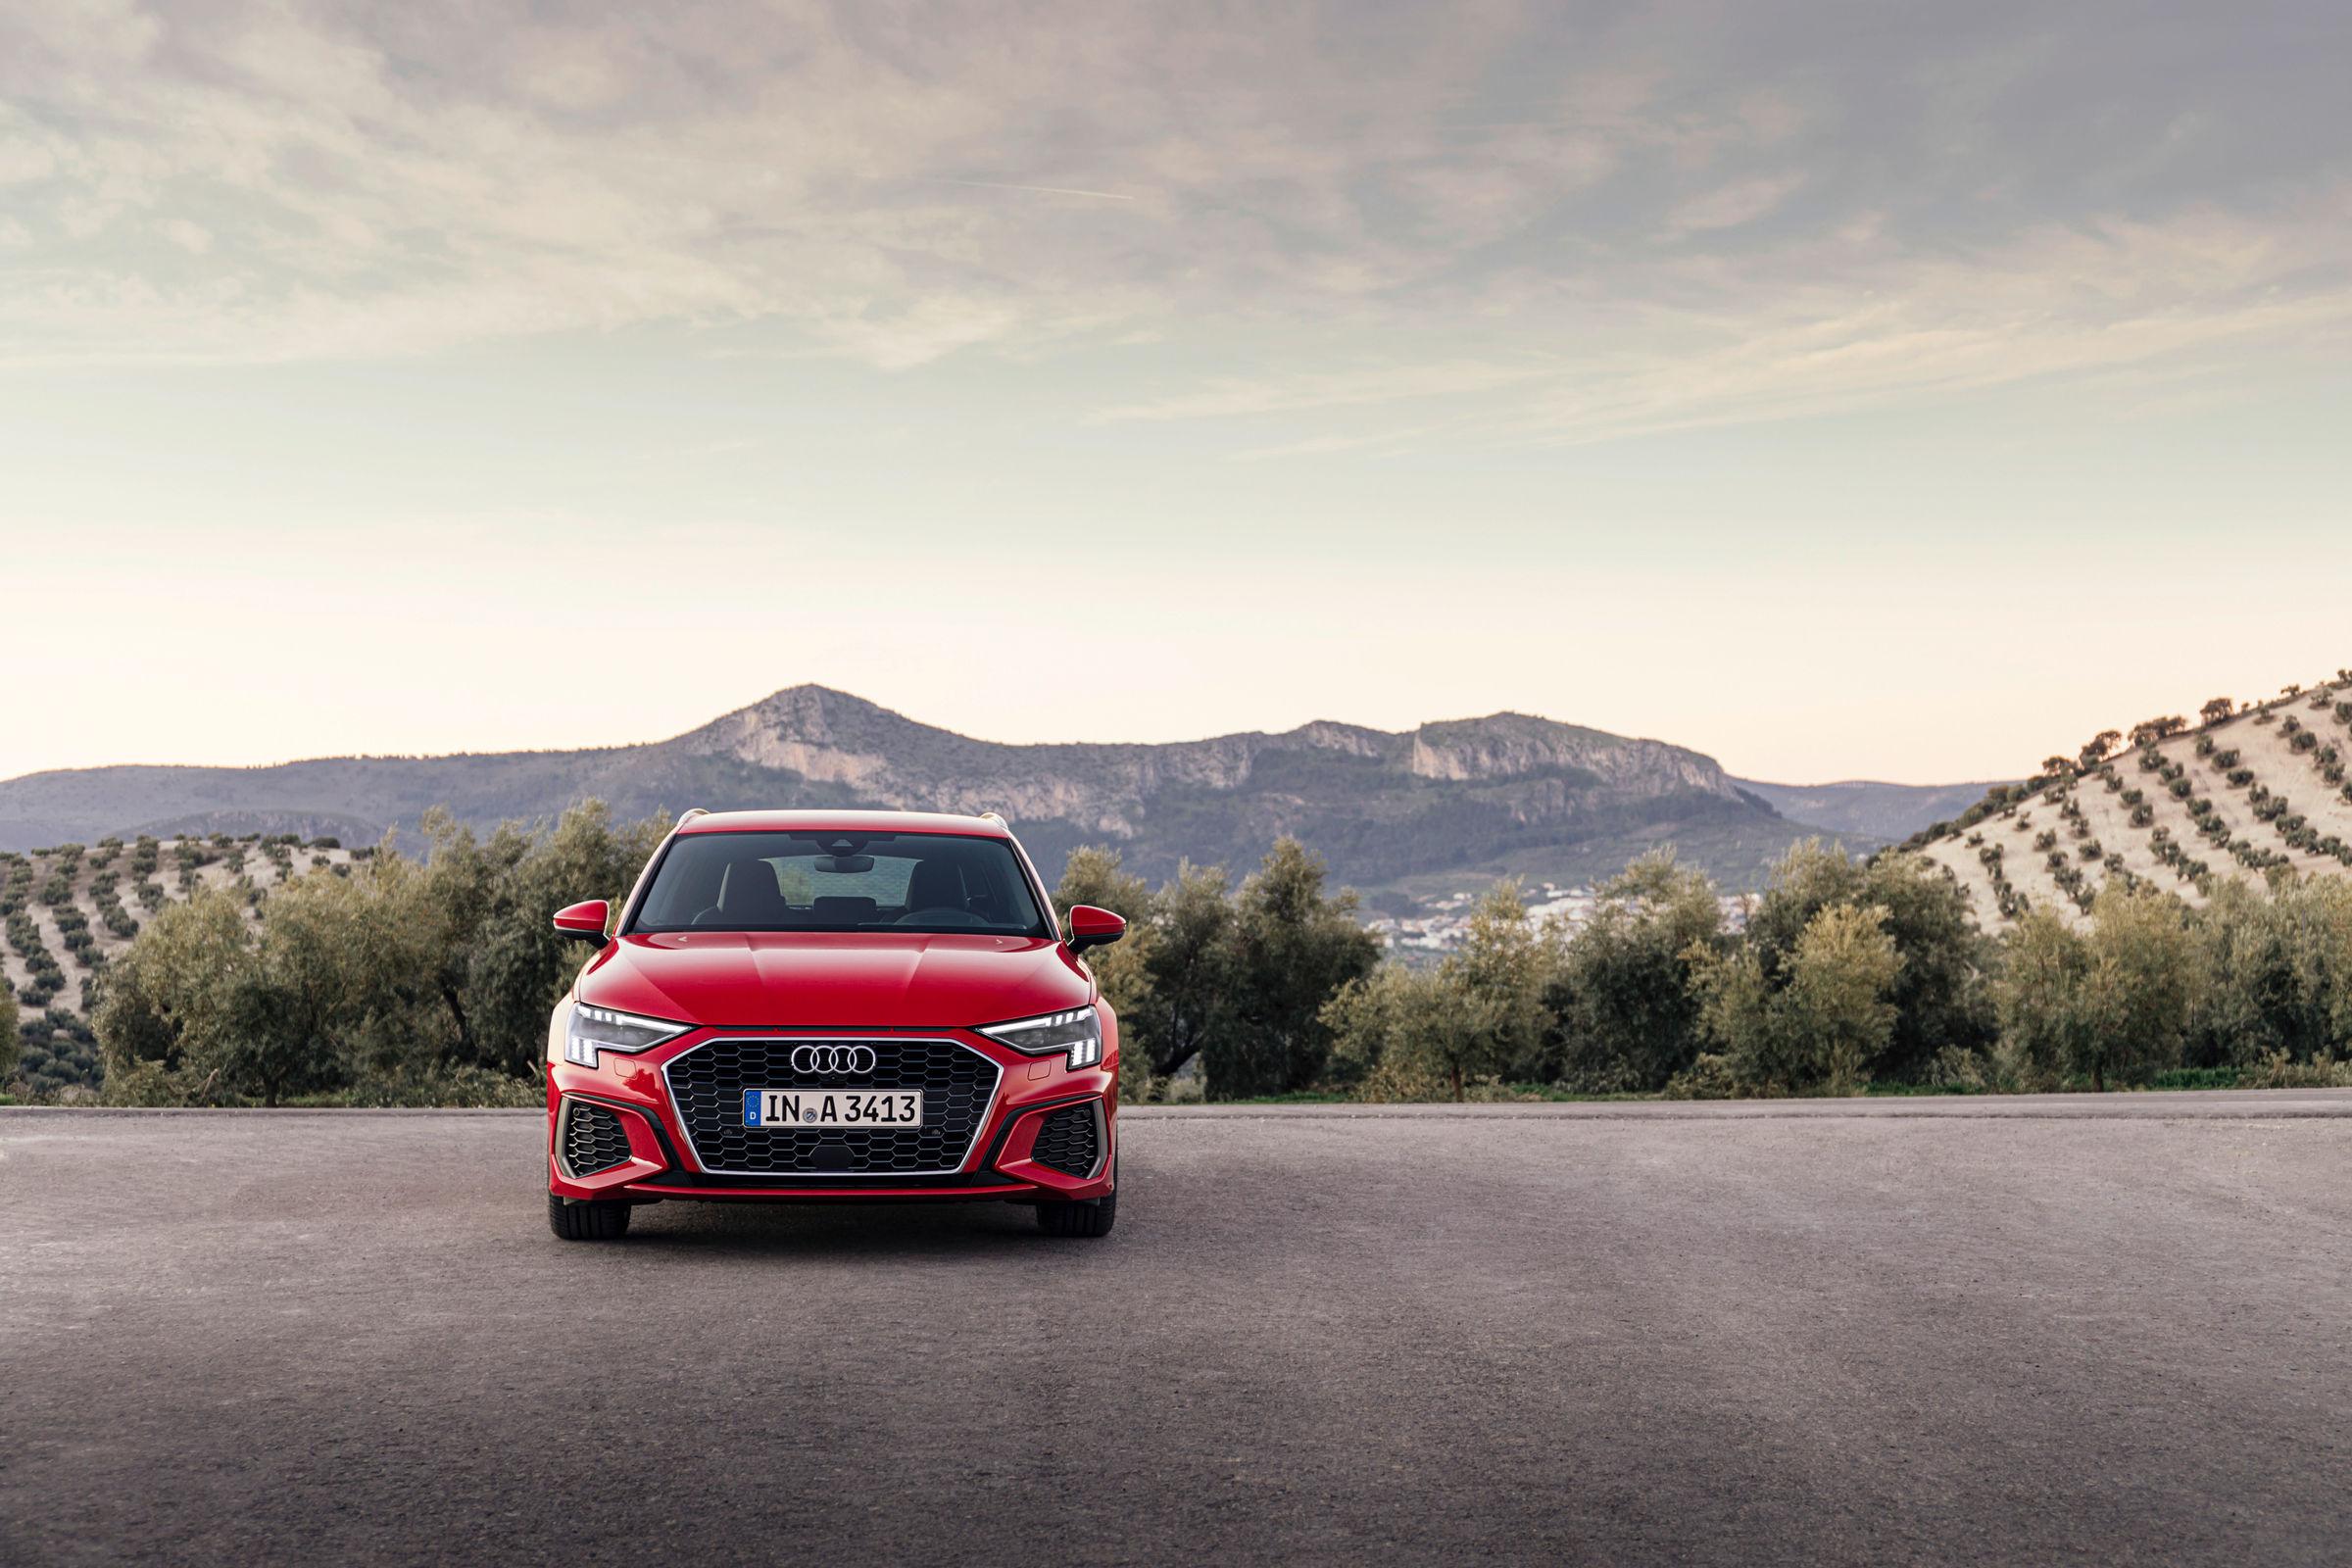 Success model 4.0: the new Audi A3 Sportback - Image 5